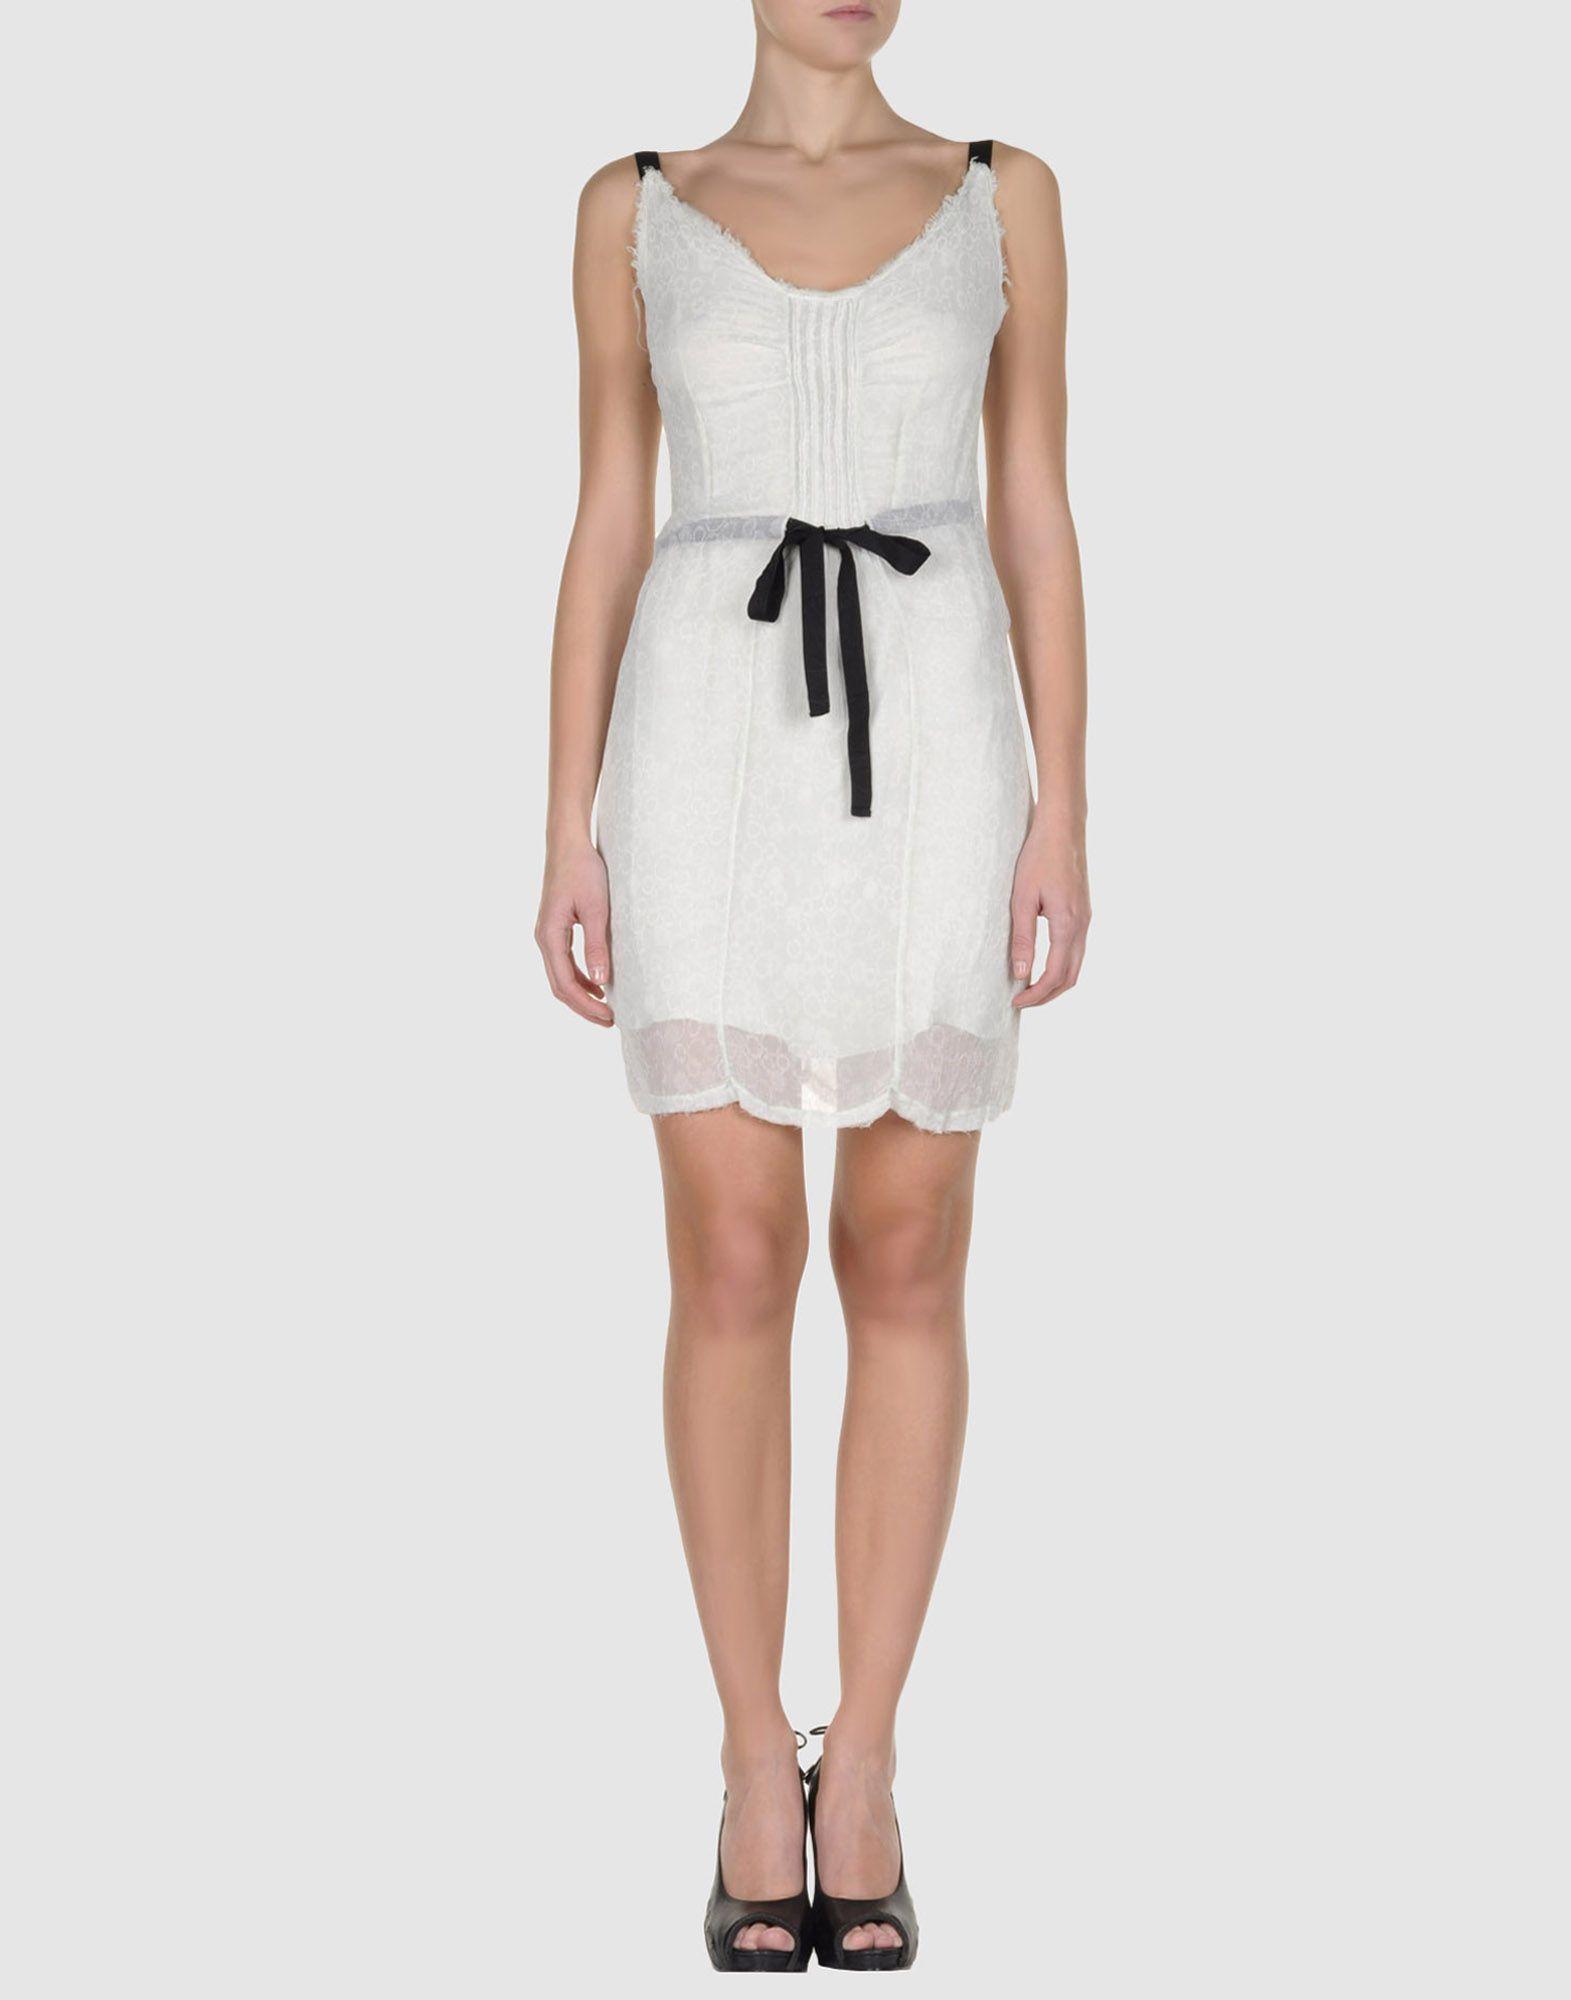 548a1955771 DIESEL BLACK GOLD Women - Dresses - Short dress DIESEL BLACK GOLD on YOOX  United States